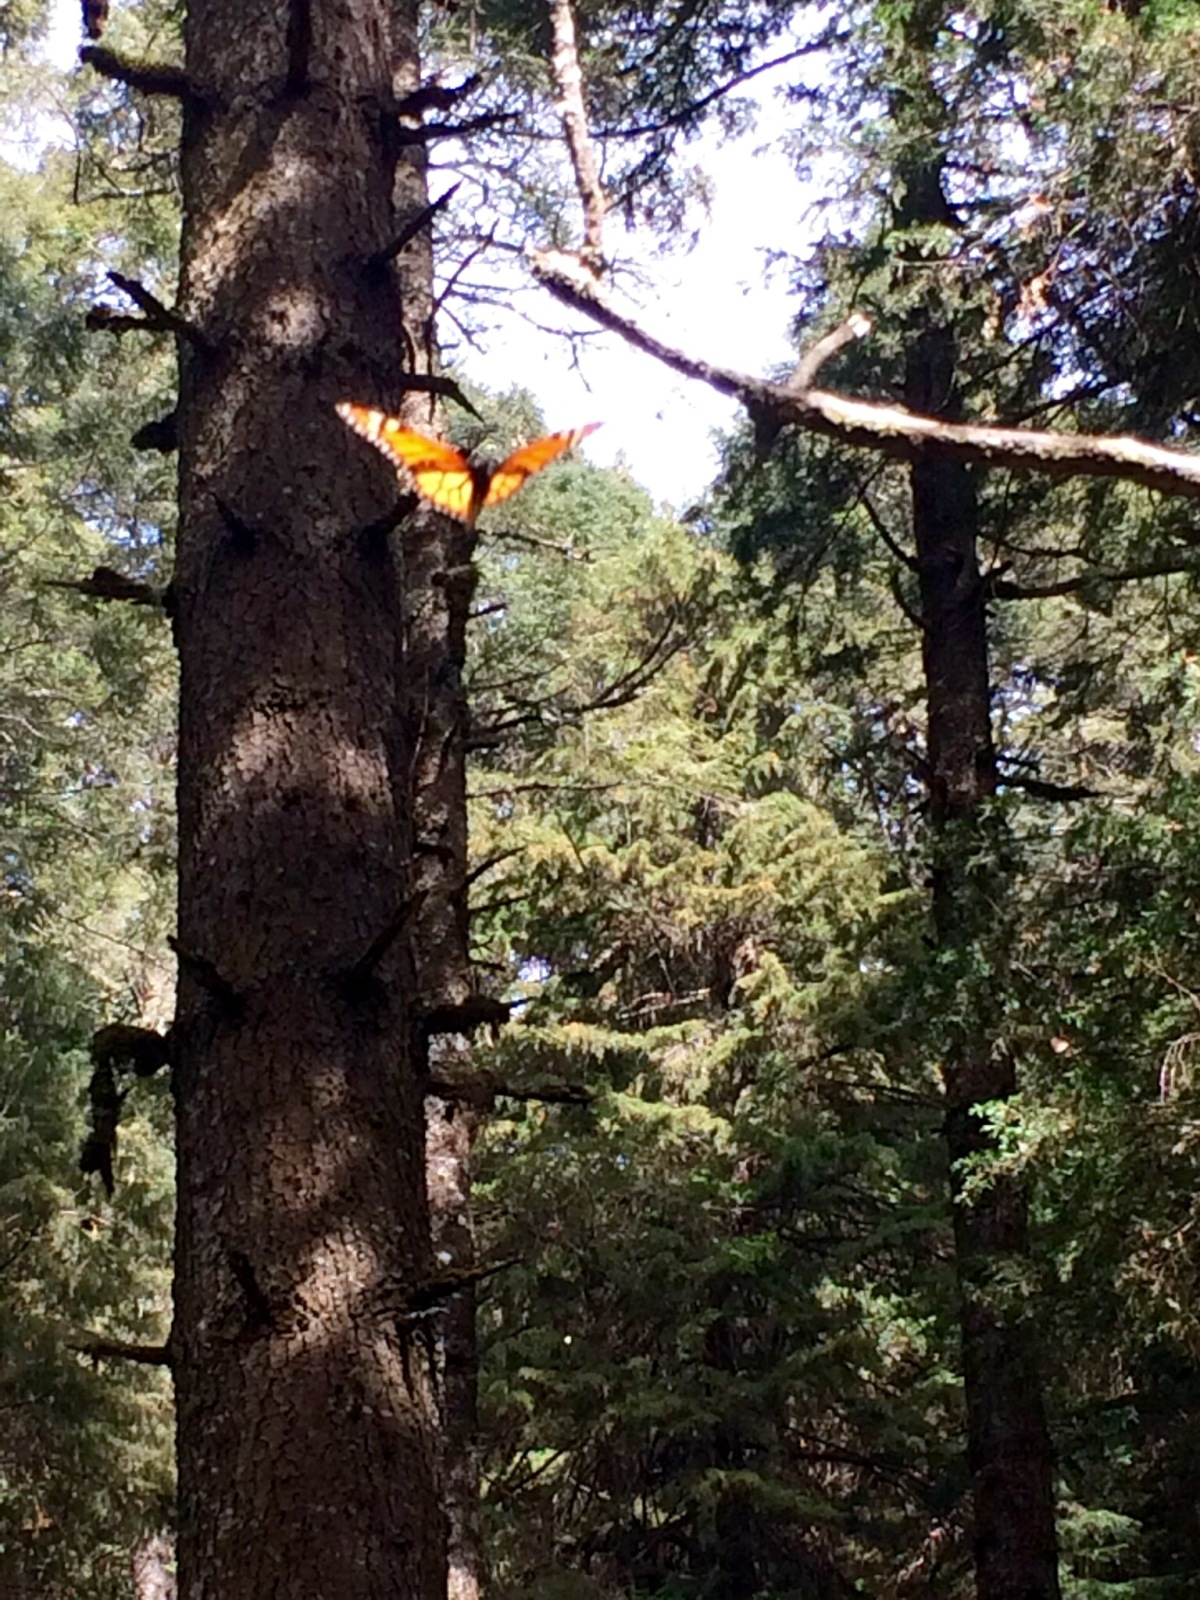 Chasing Butterflies at the Reserva MariposaMonarca